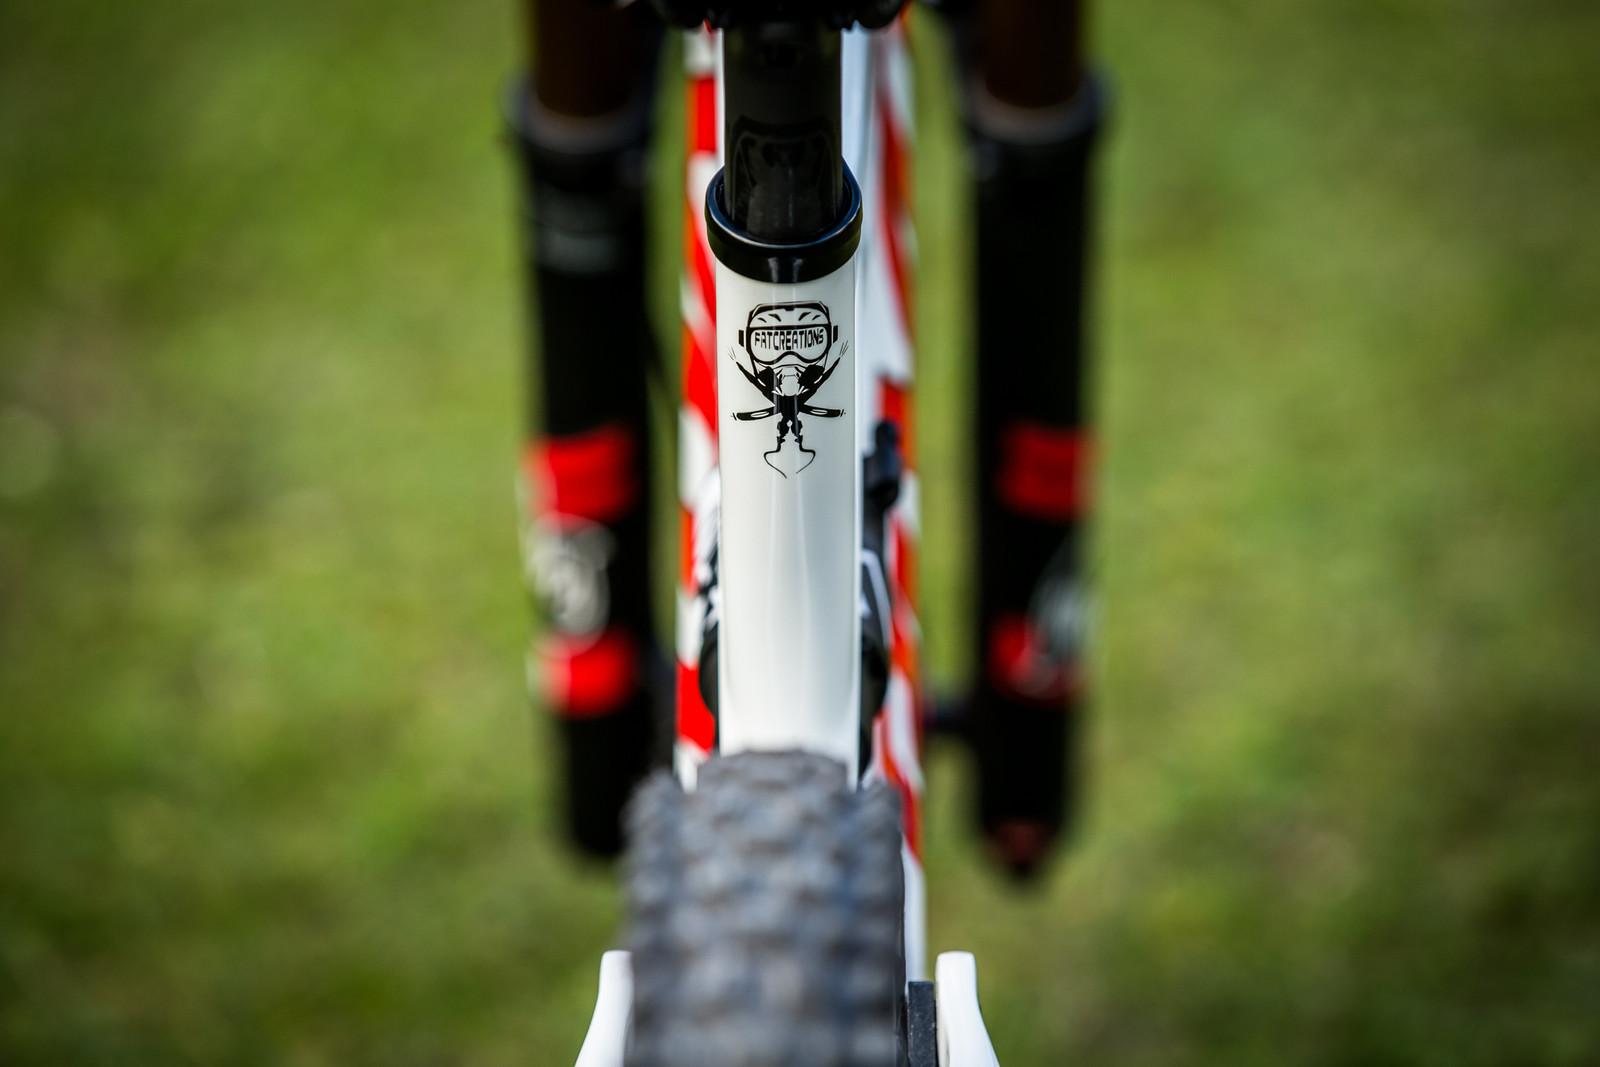 Fat Creations - WORLD CHAMPS BIKE - Emilie Siegenthaler's Pivot Phoenix - Mountain Biking Pictures - Vital MTB